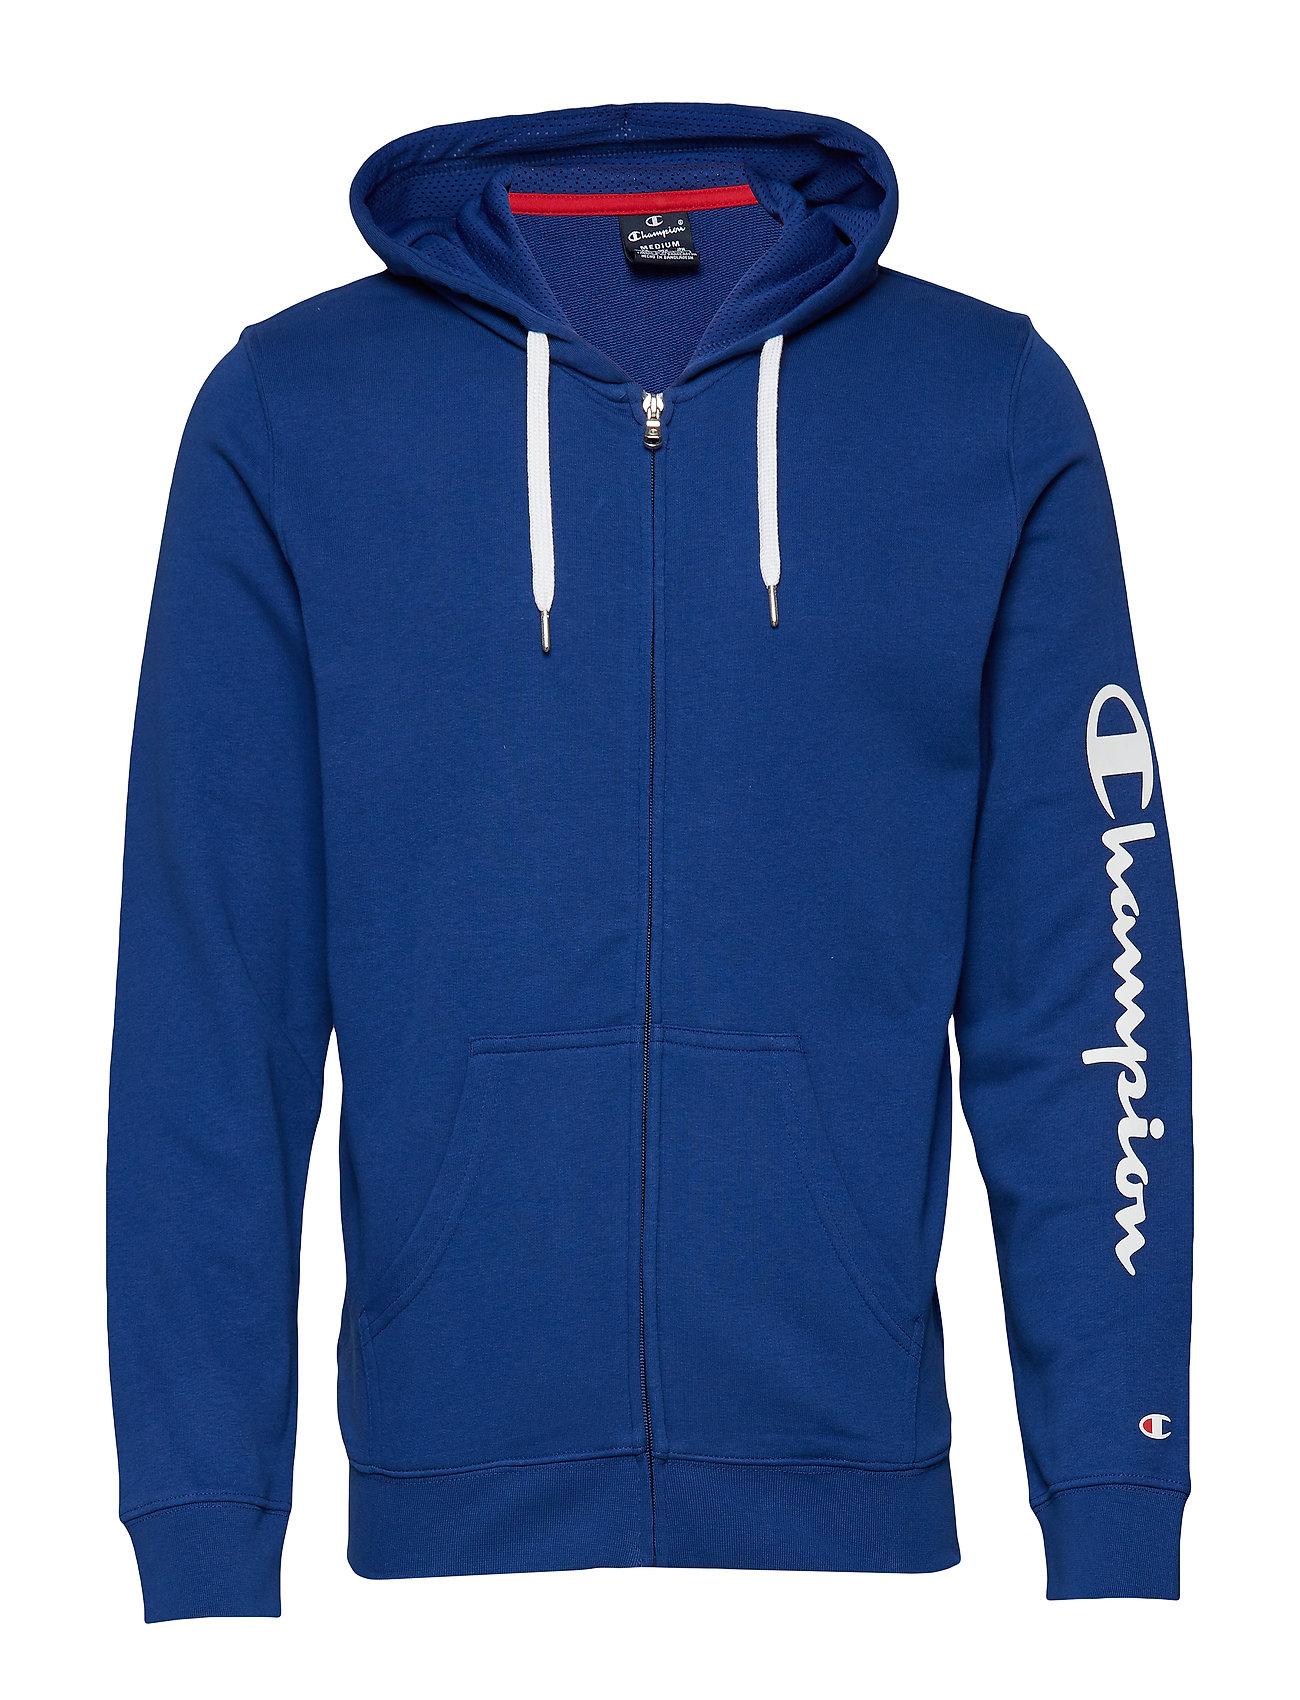 Champion Hooded Full Zip Sweatshirt - SODALITE BLUE